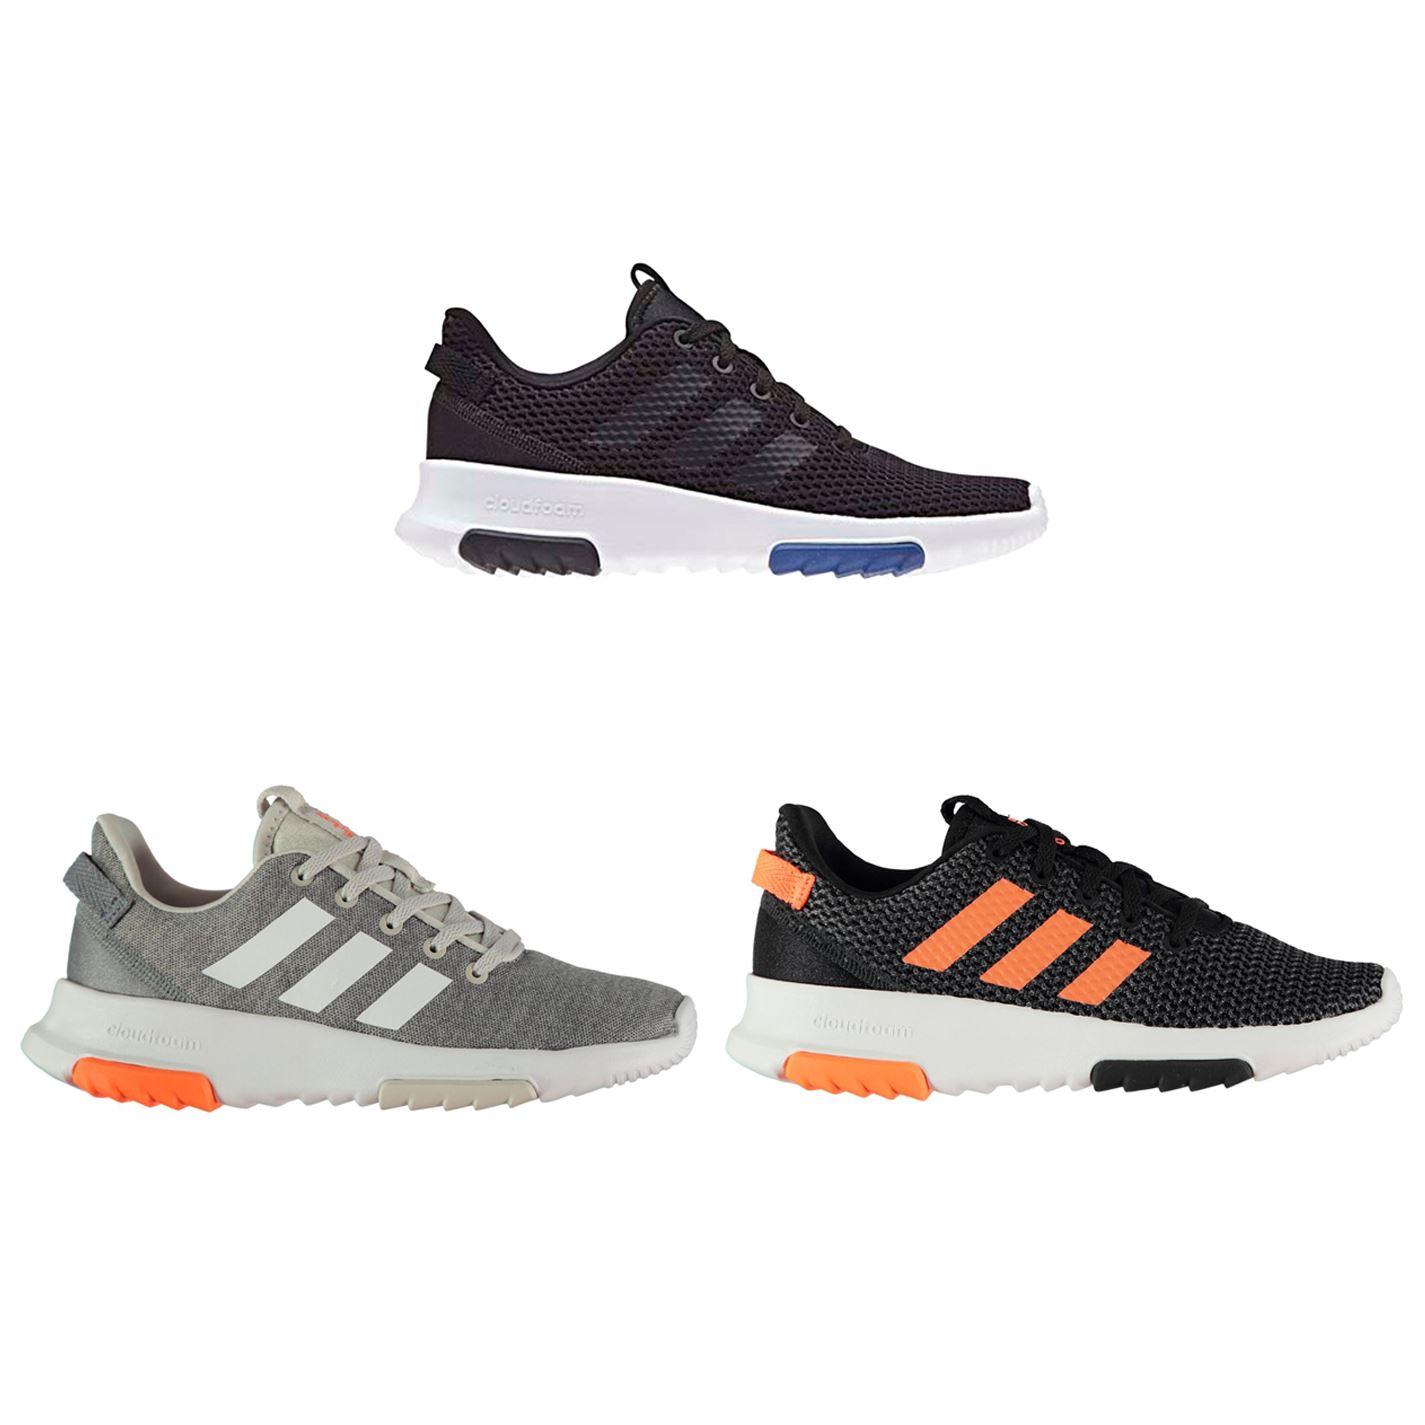 half off 2bca6 f1f6f ... Adidas CloudFoam Racer TR bambino ragazzi formatori scarpe calzature ...